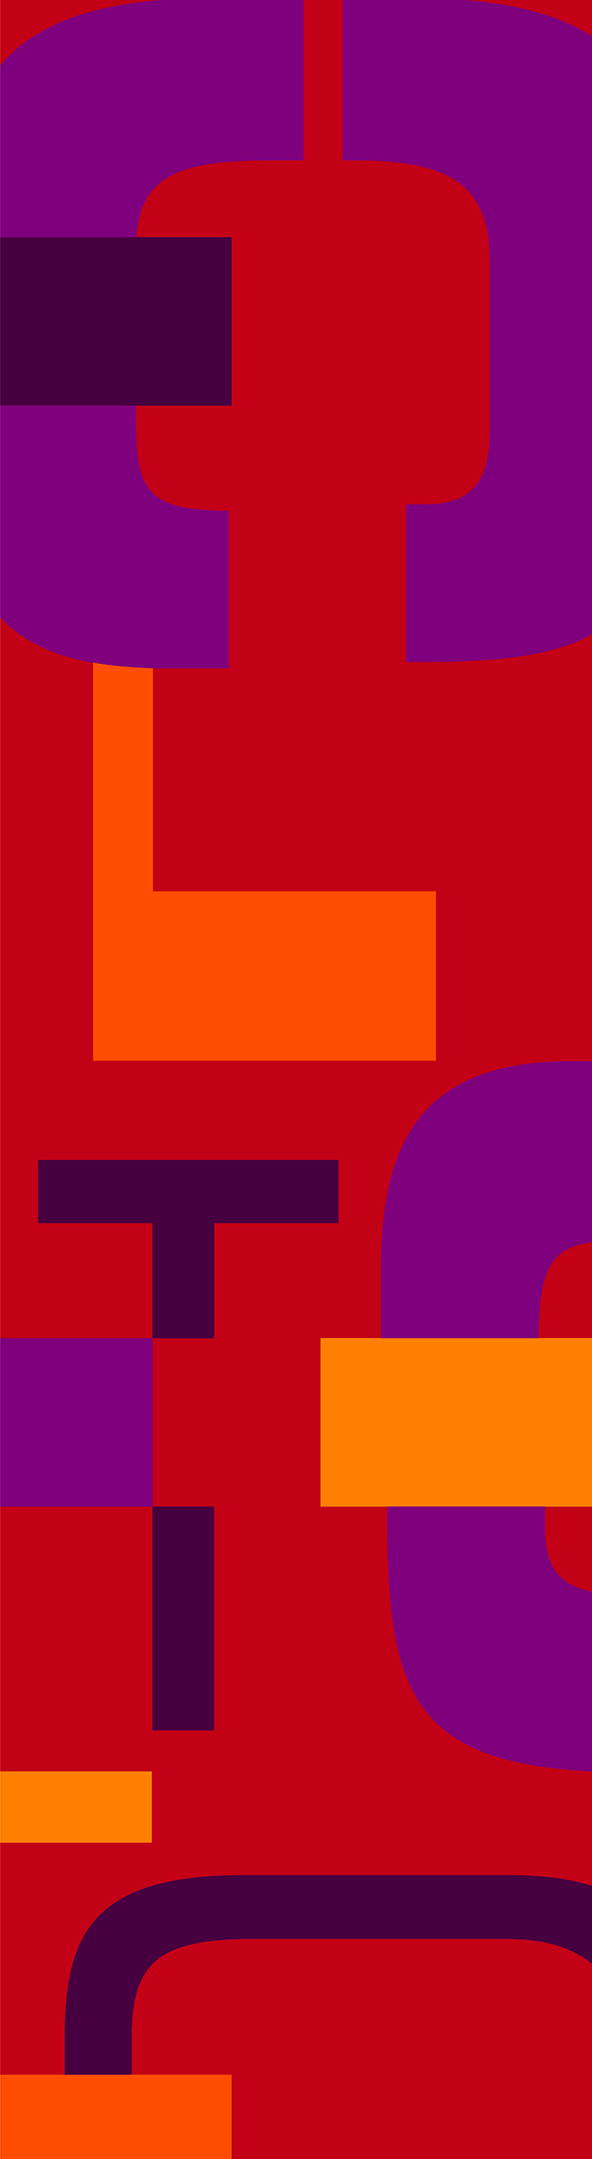 CTCL Pattern_color_3.jpg